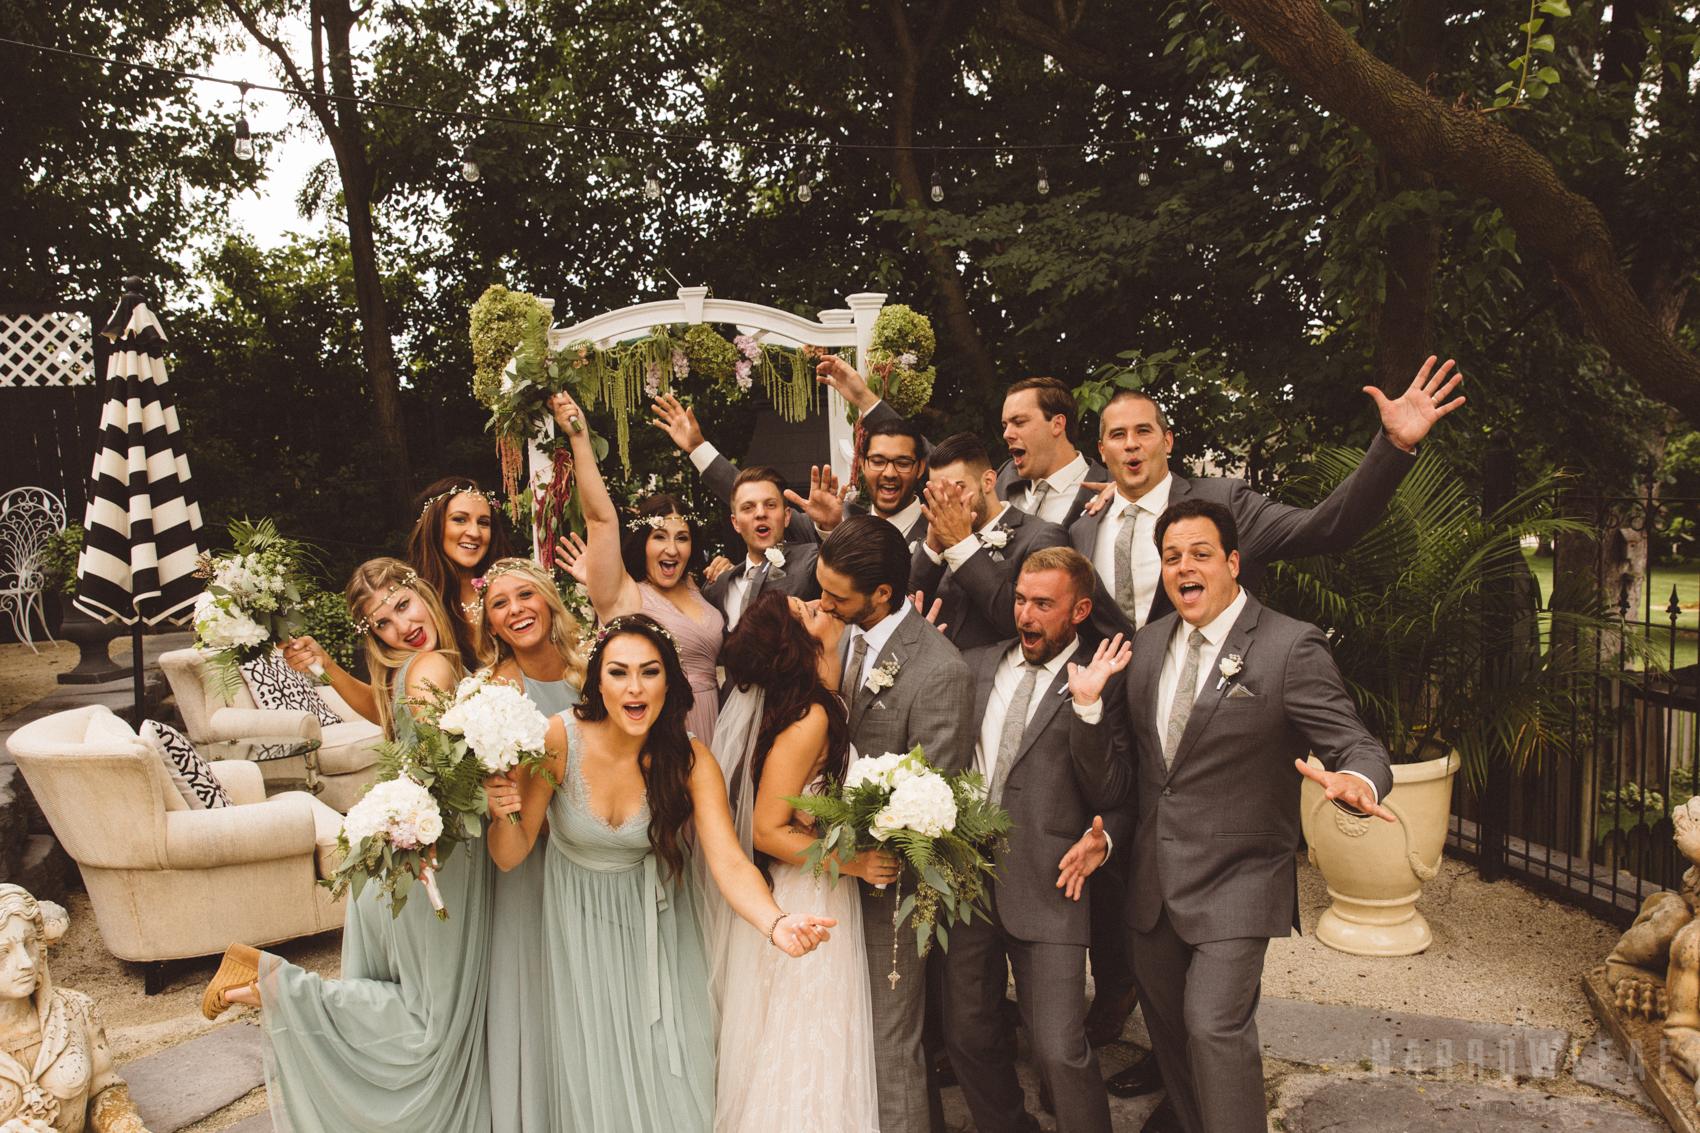 Lake-Geneva-WI-Wedding-bridal-party-formals-3853.jpg